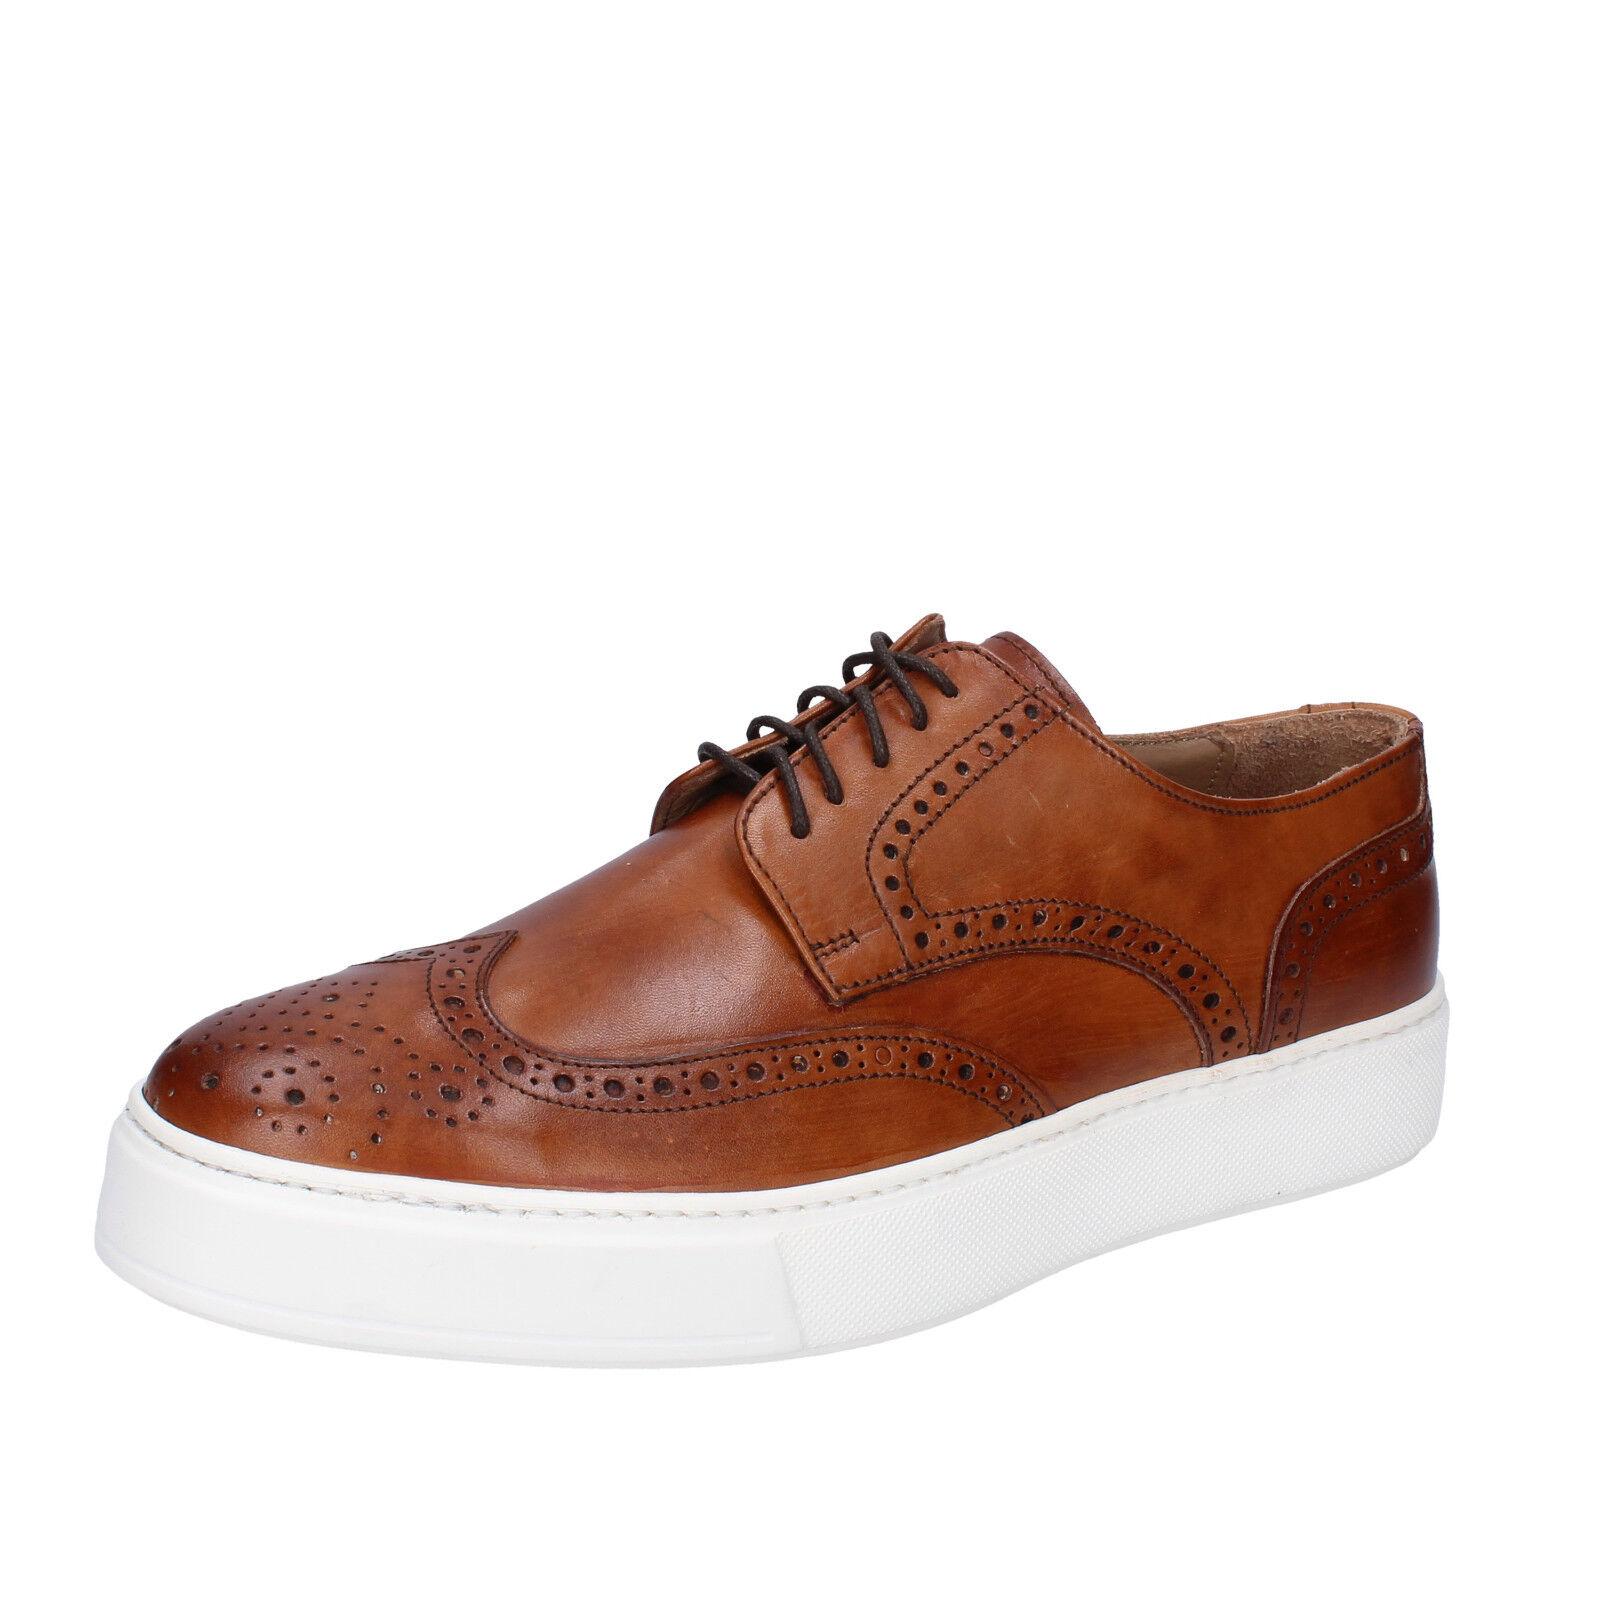 Herren schuhe DI MELLA 43 EU elegante sneakers braun leder AB930-D